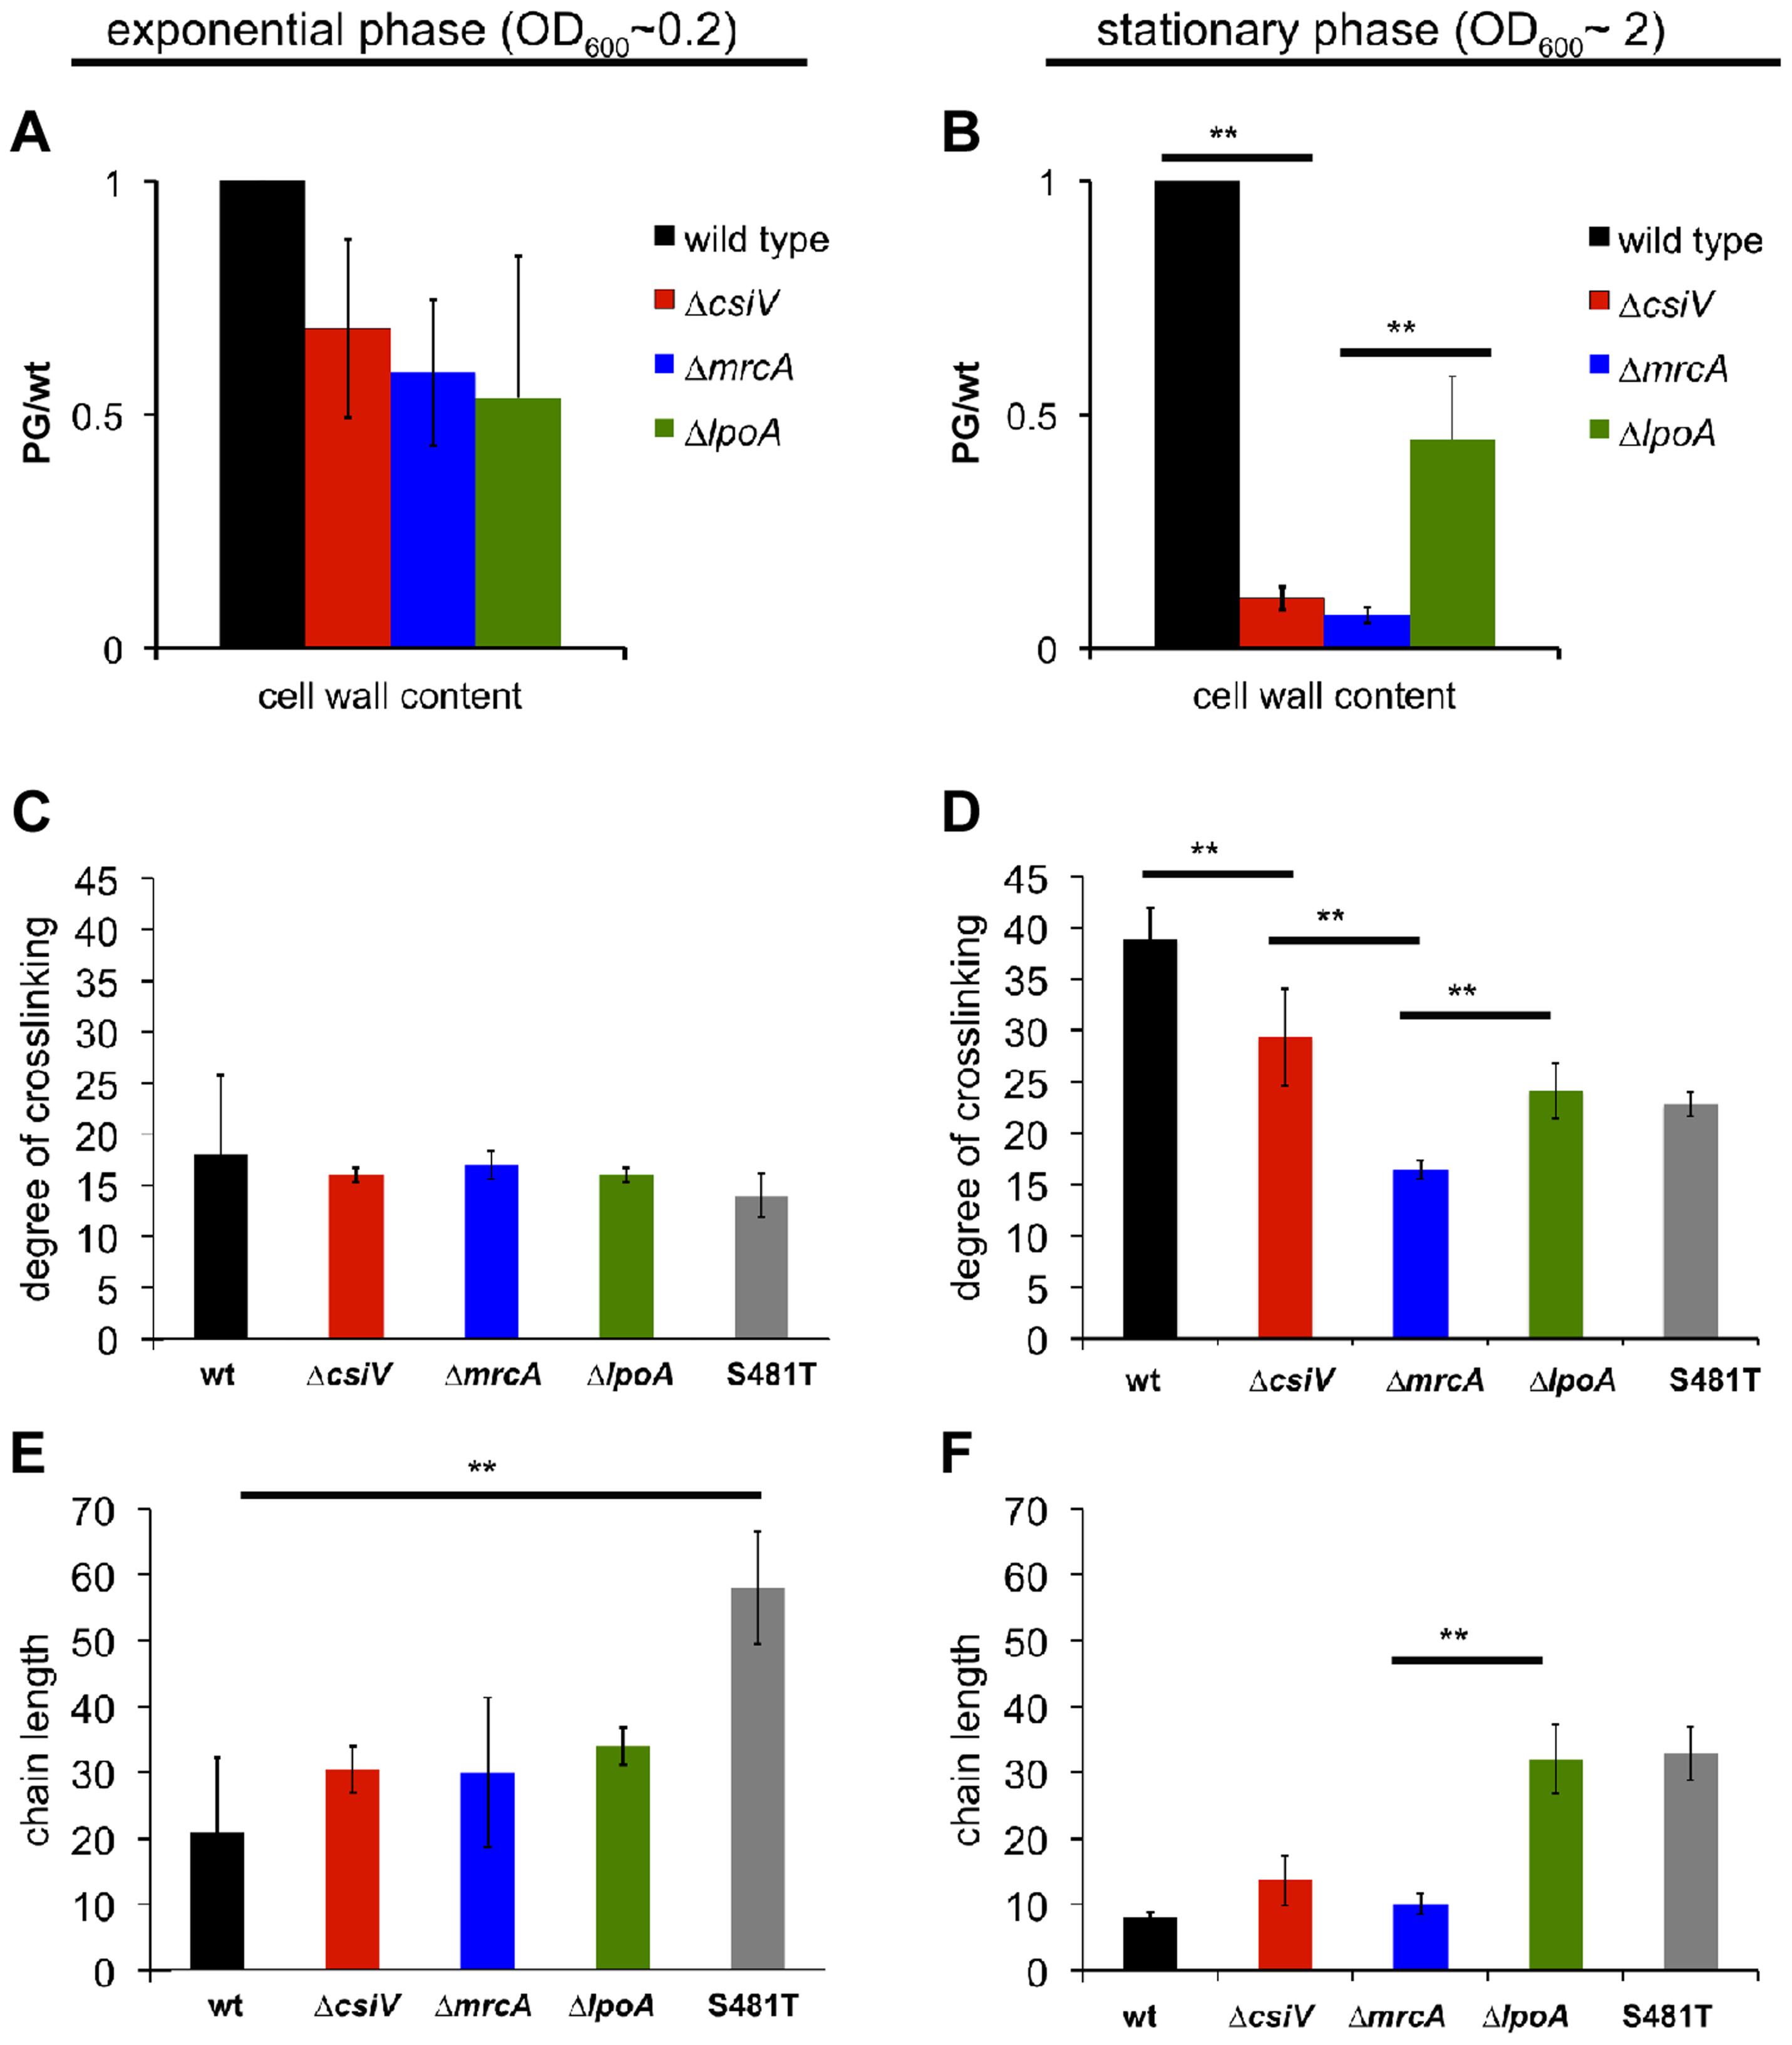 Muropeptide analysis of the <i>csiV</i>, <i>mrcA</i> and <i>lpoA</i> mutants.